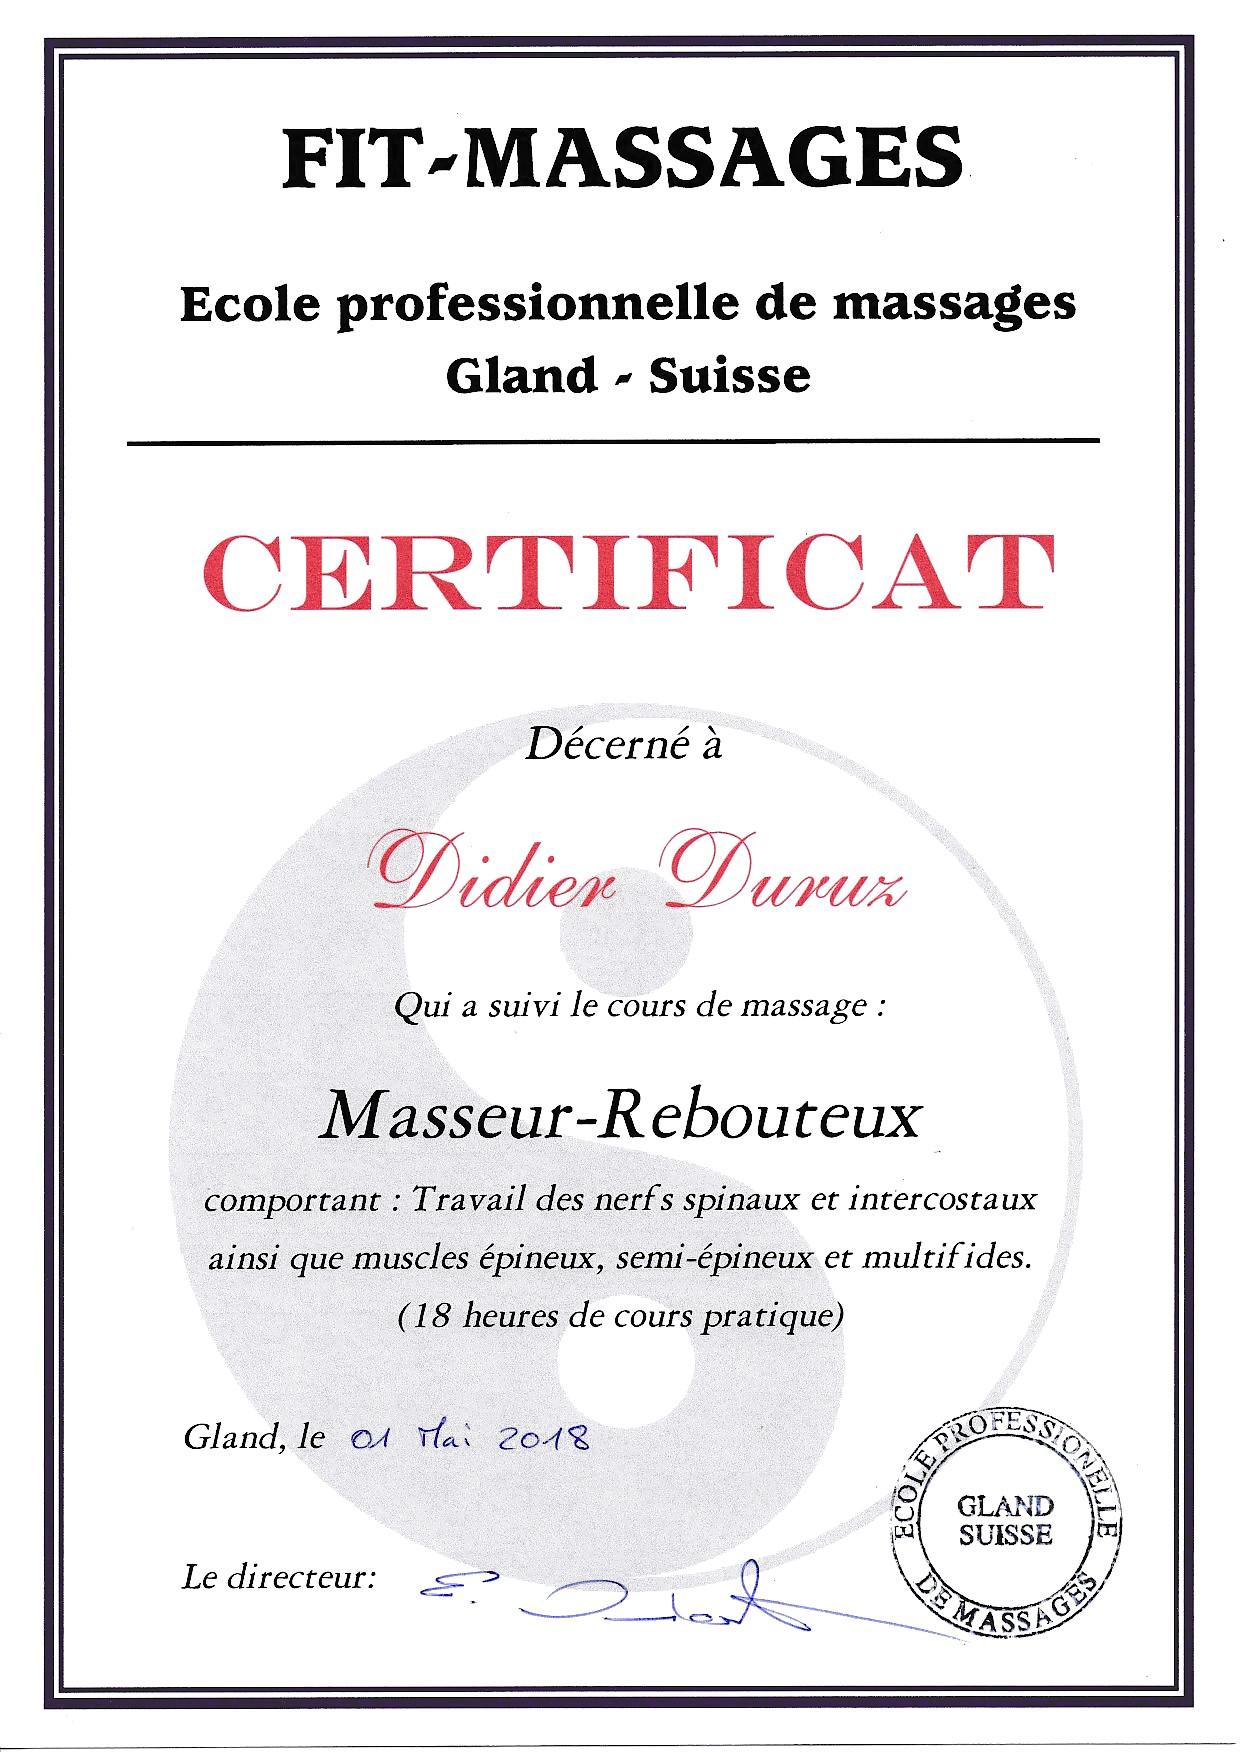 2018-Certificat Masseur-Rebouteux